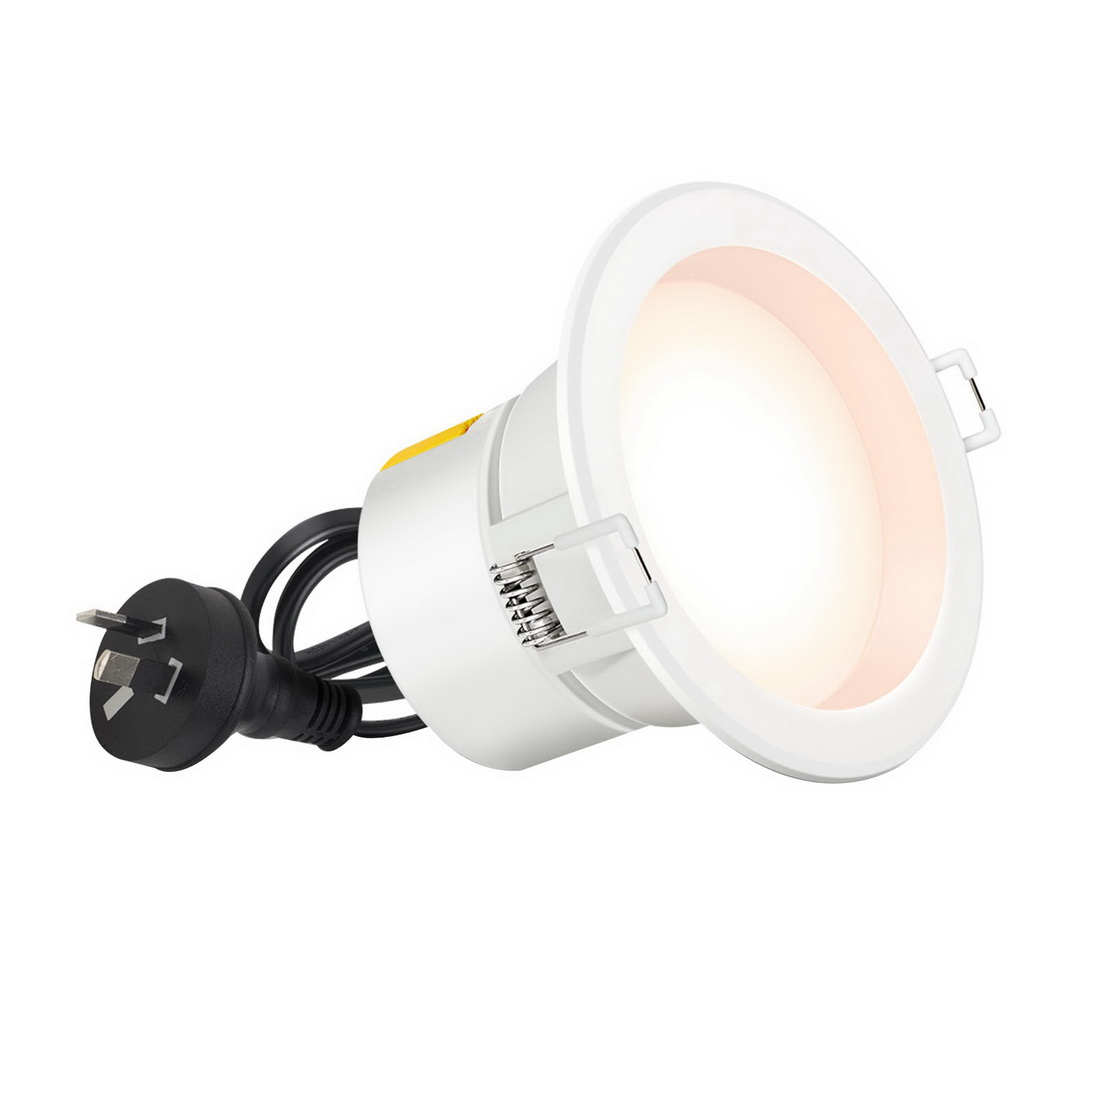 7W White 90mm LED Downlight Cool White